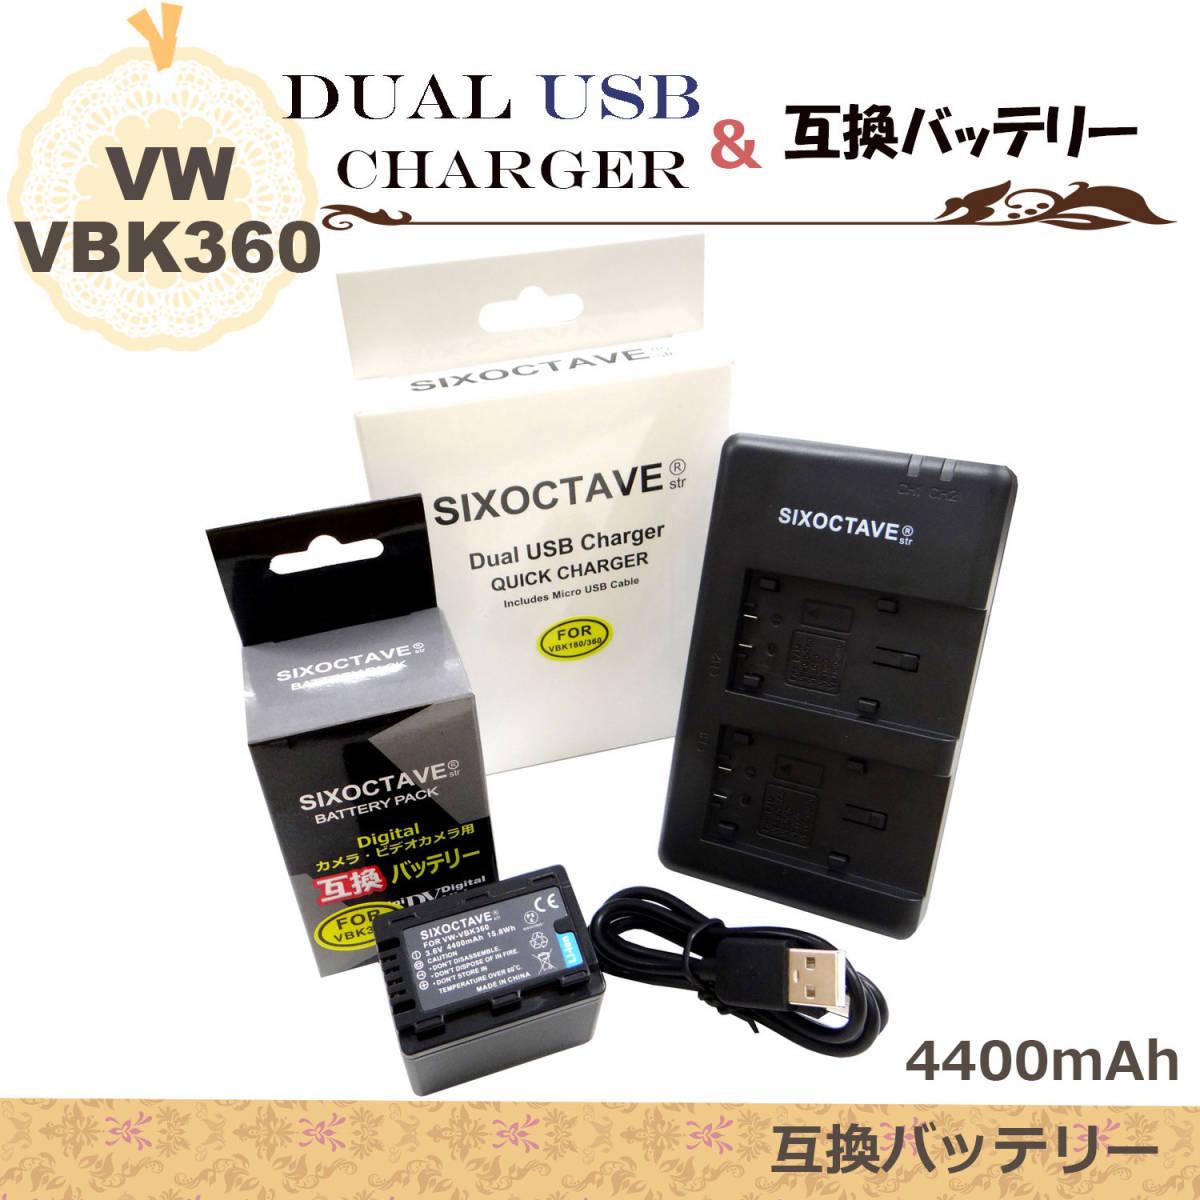 Panasonicパナソニック VW-VBK360-K互換バッテリーと互換デュアルUSBチャージャーHC-V700M/HC-V600M/HC-V300M/HC-V100M/HDC-TM90_画像1